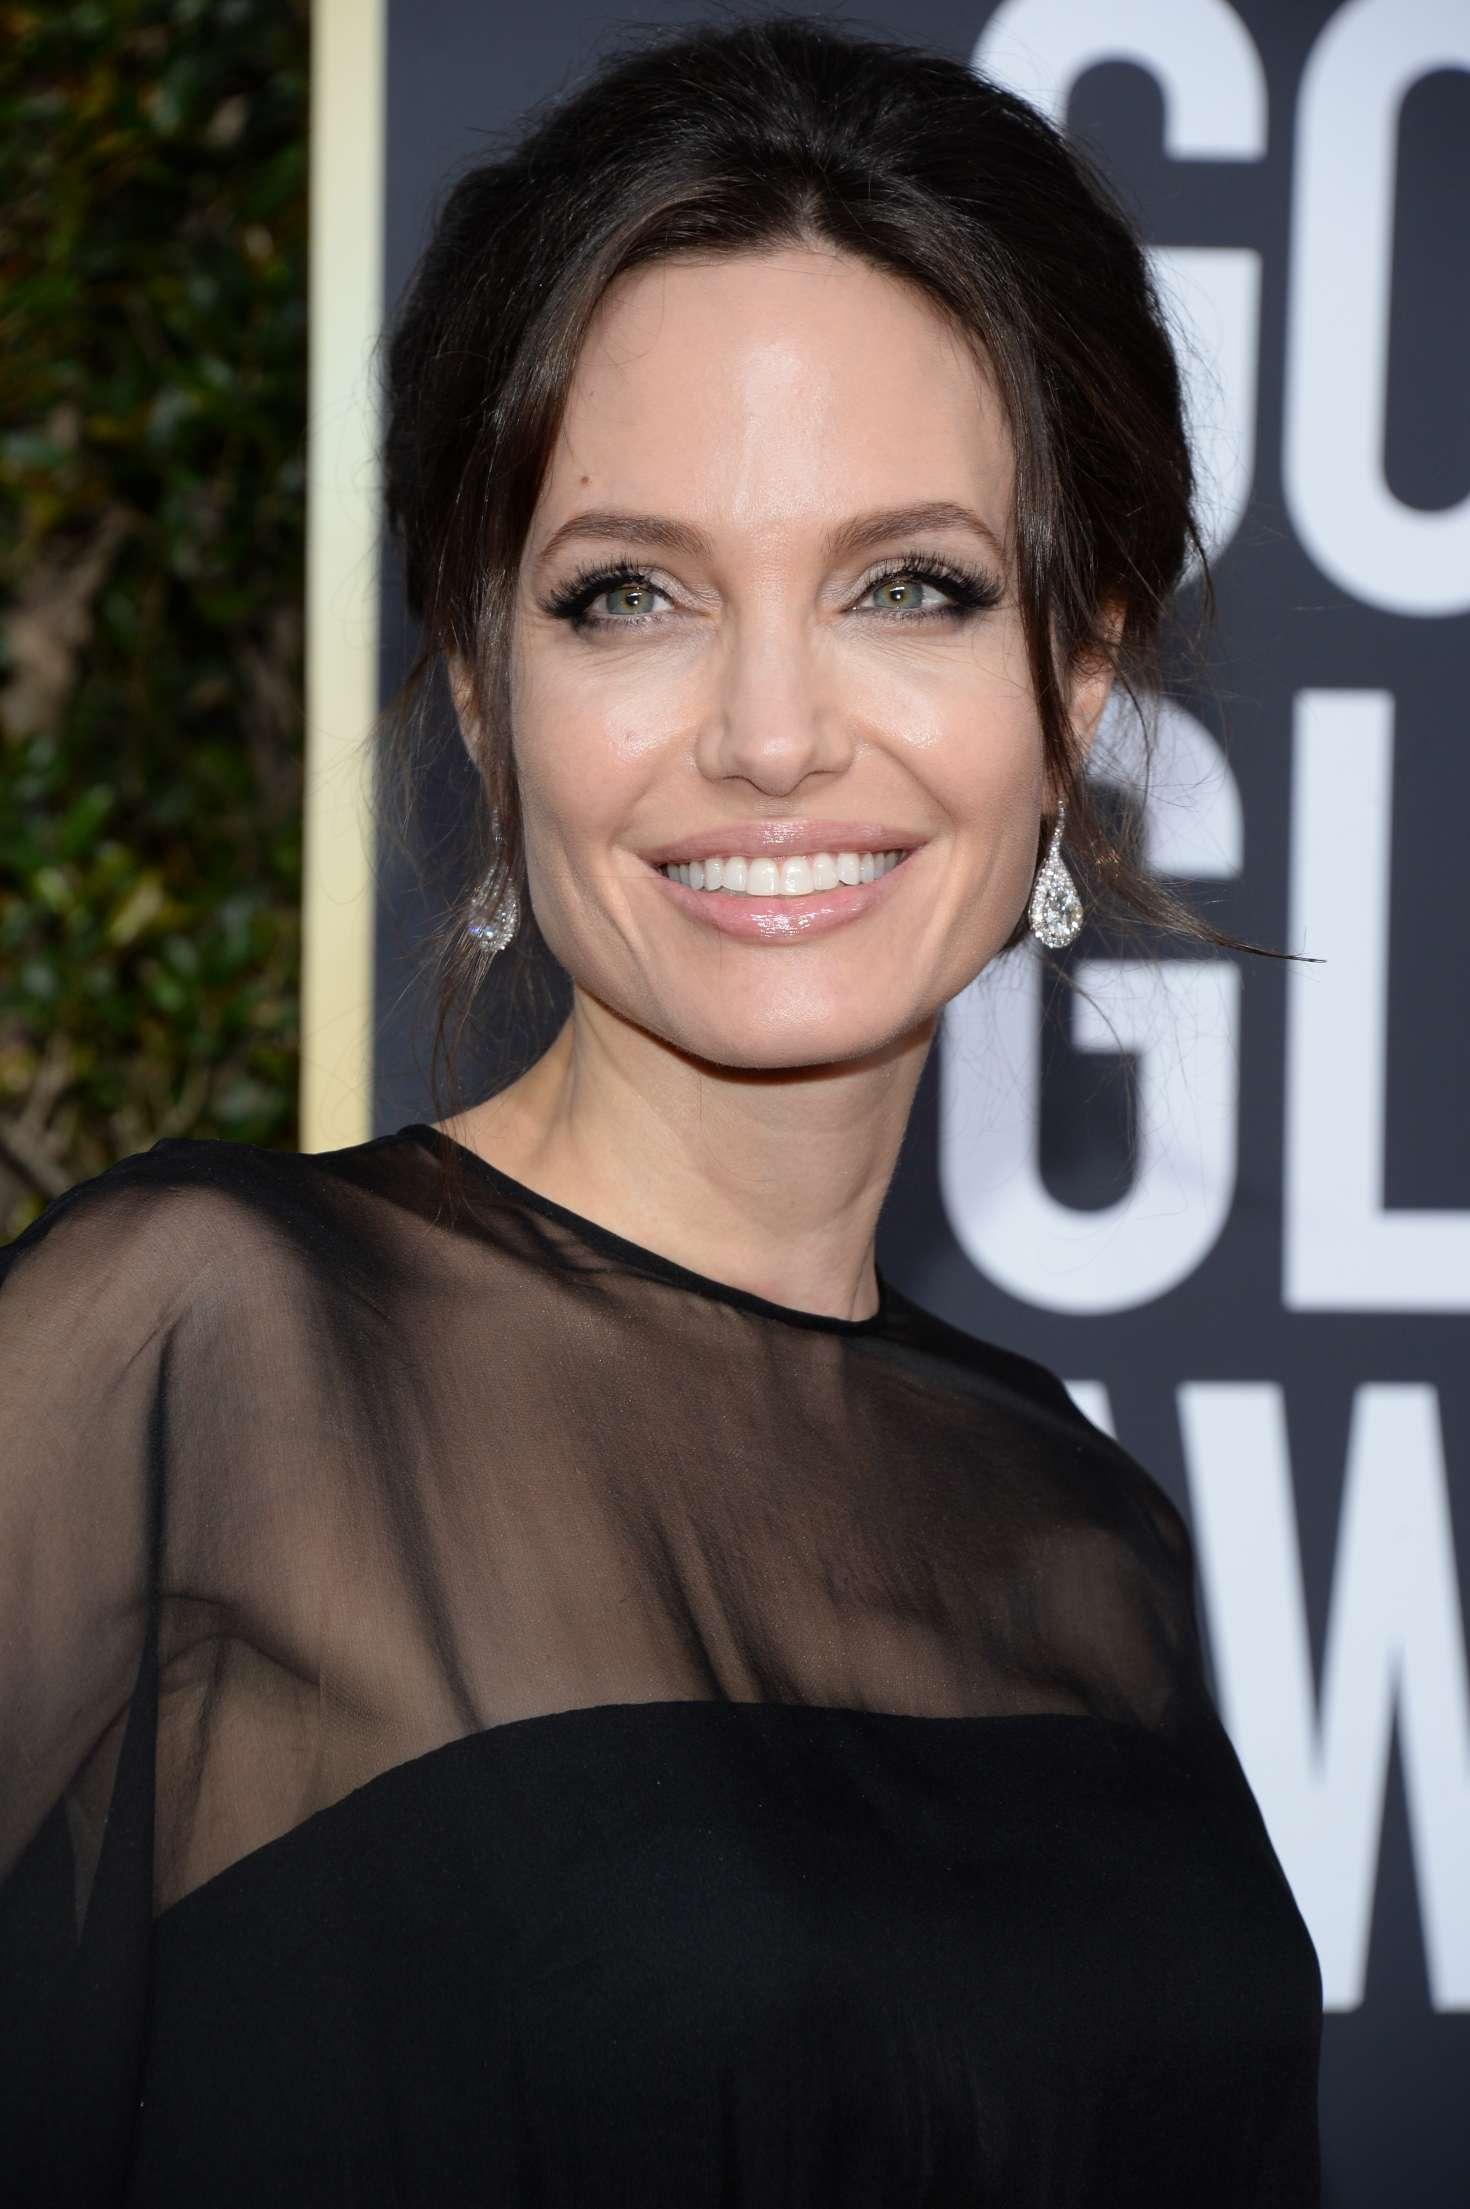 Angelina Jolie - 2018 Golden Globe Awards in Beverly Hills